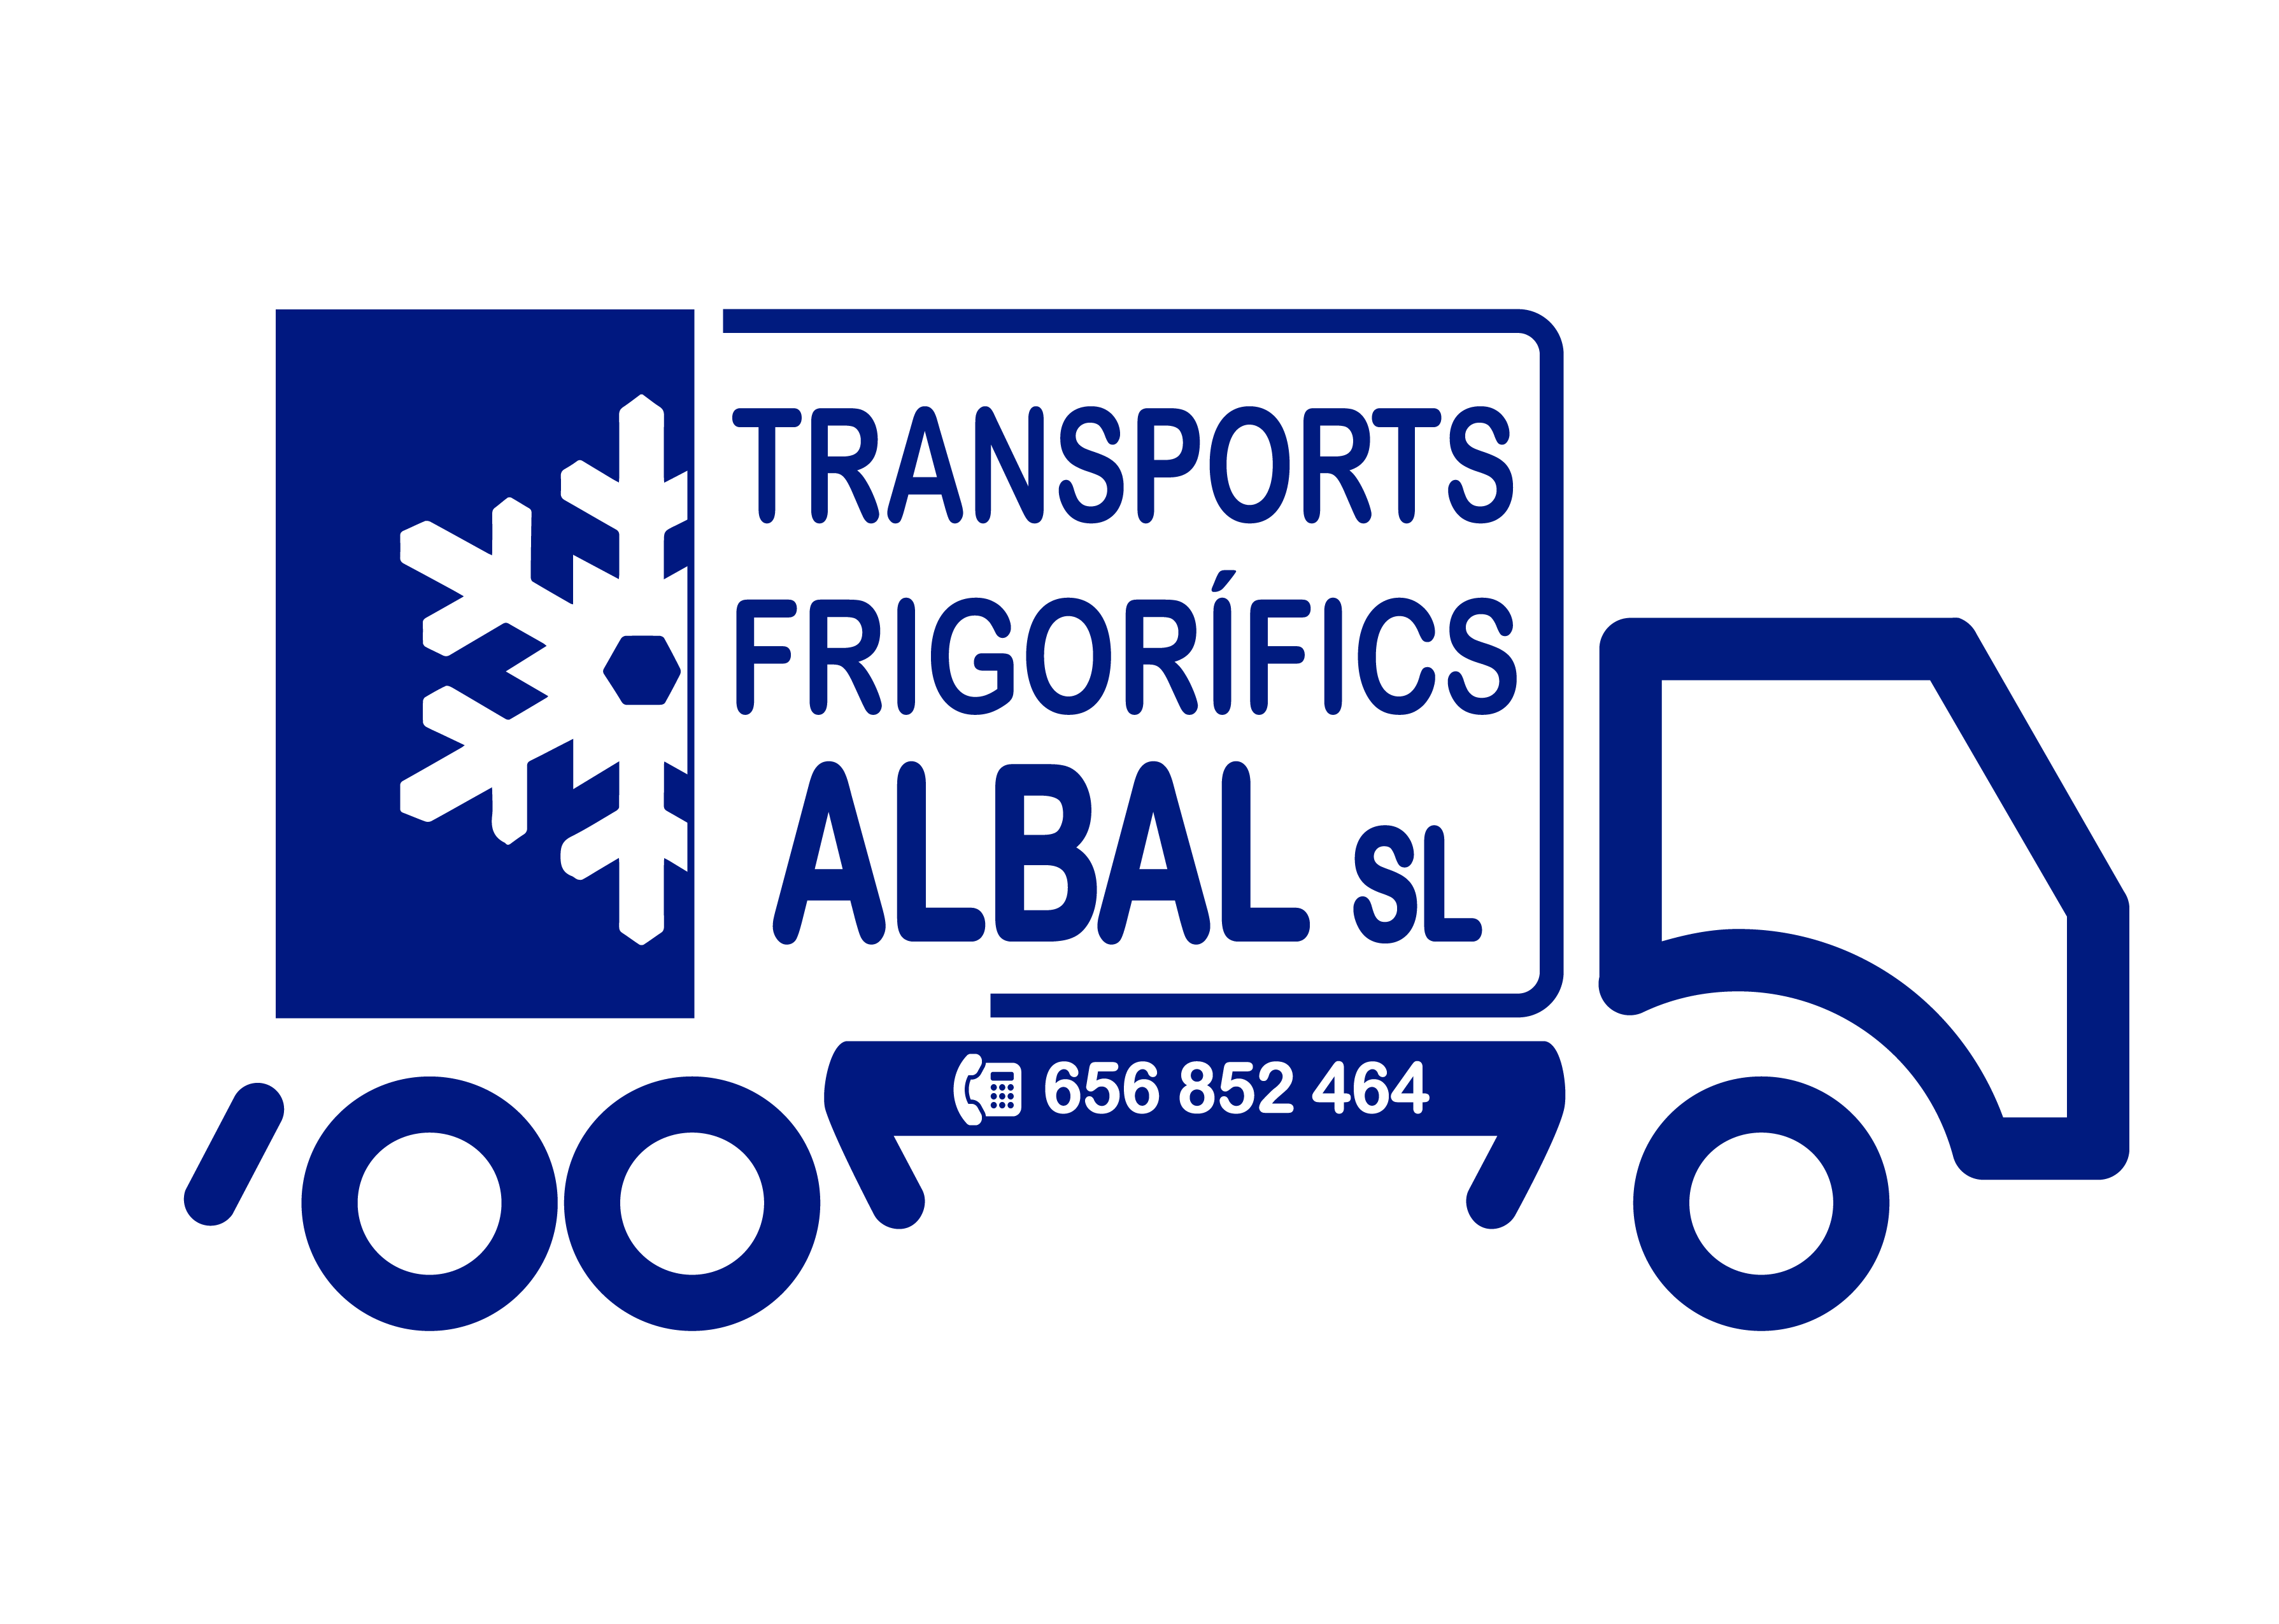 Transportes Frigoríficos Albal